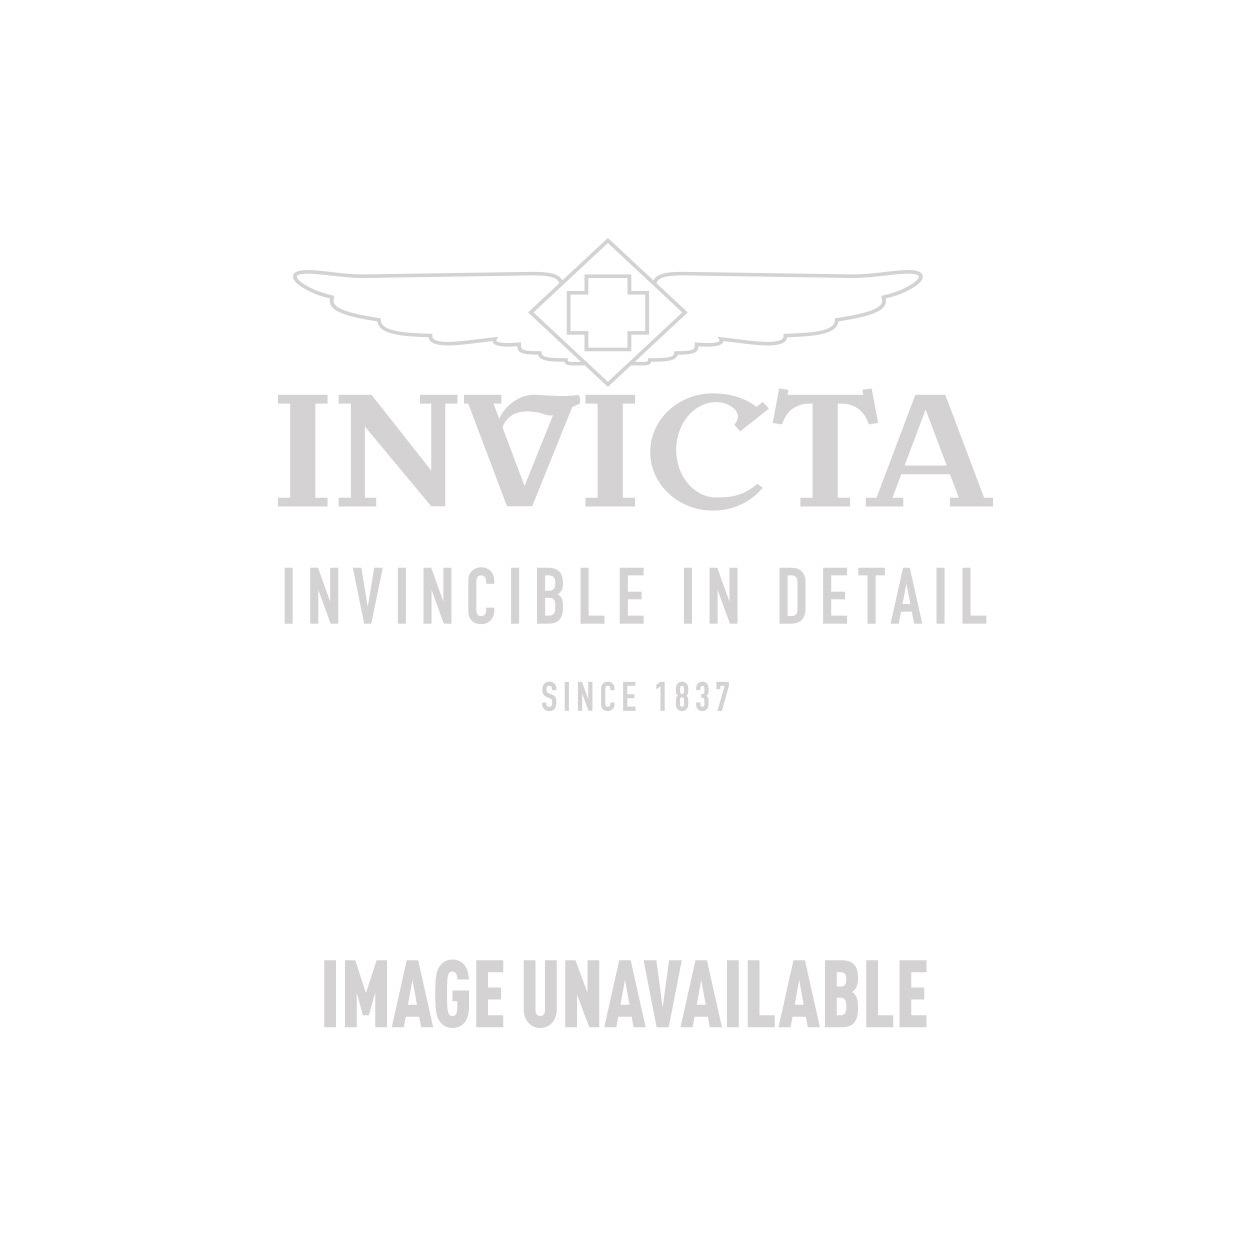 Invicta Subaqua Automatic Watch - Black, Titanium case with Black tone Stainless Steel, Polyurethane band - Model 20191